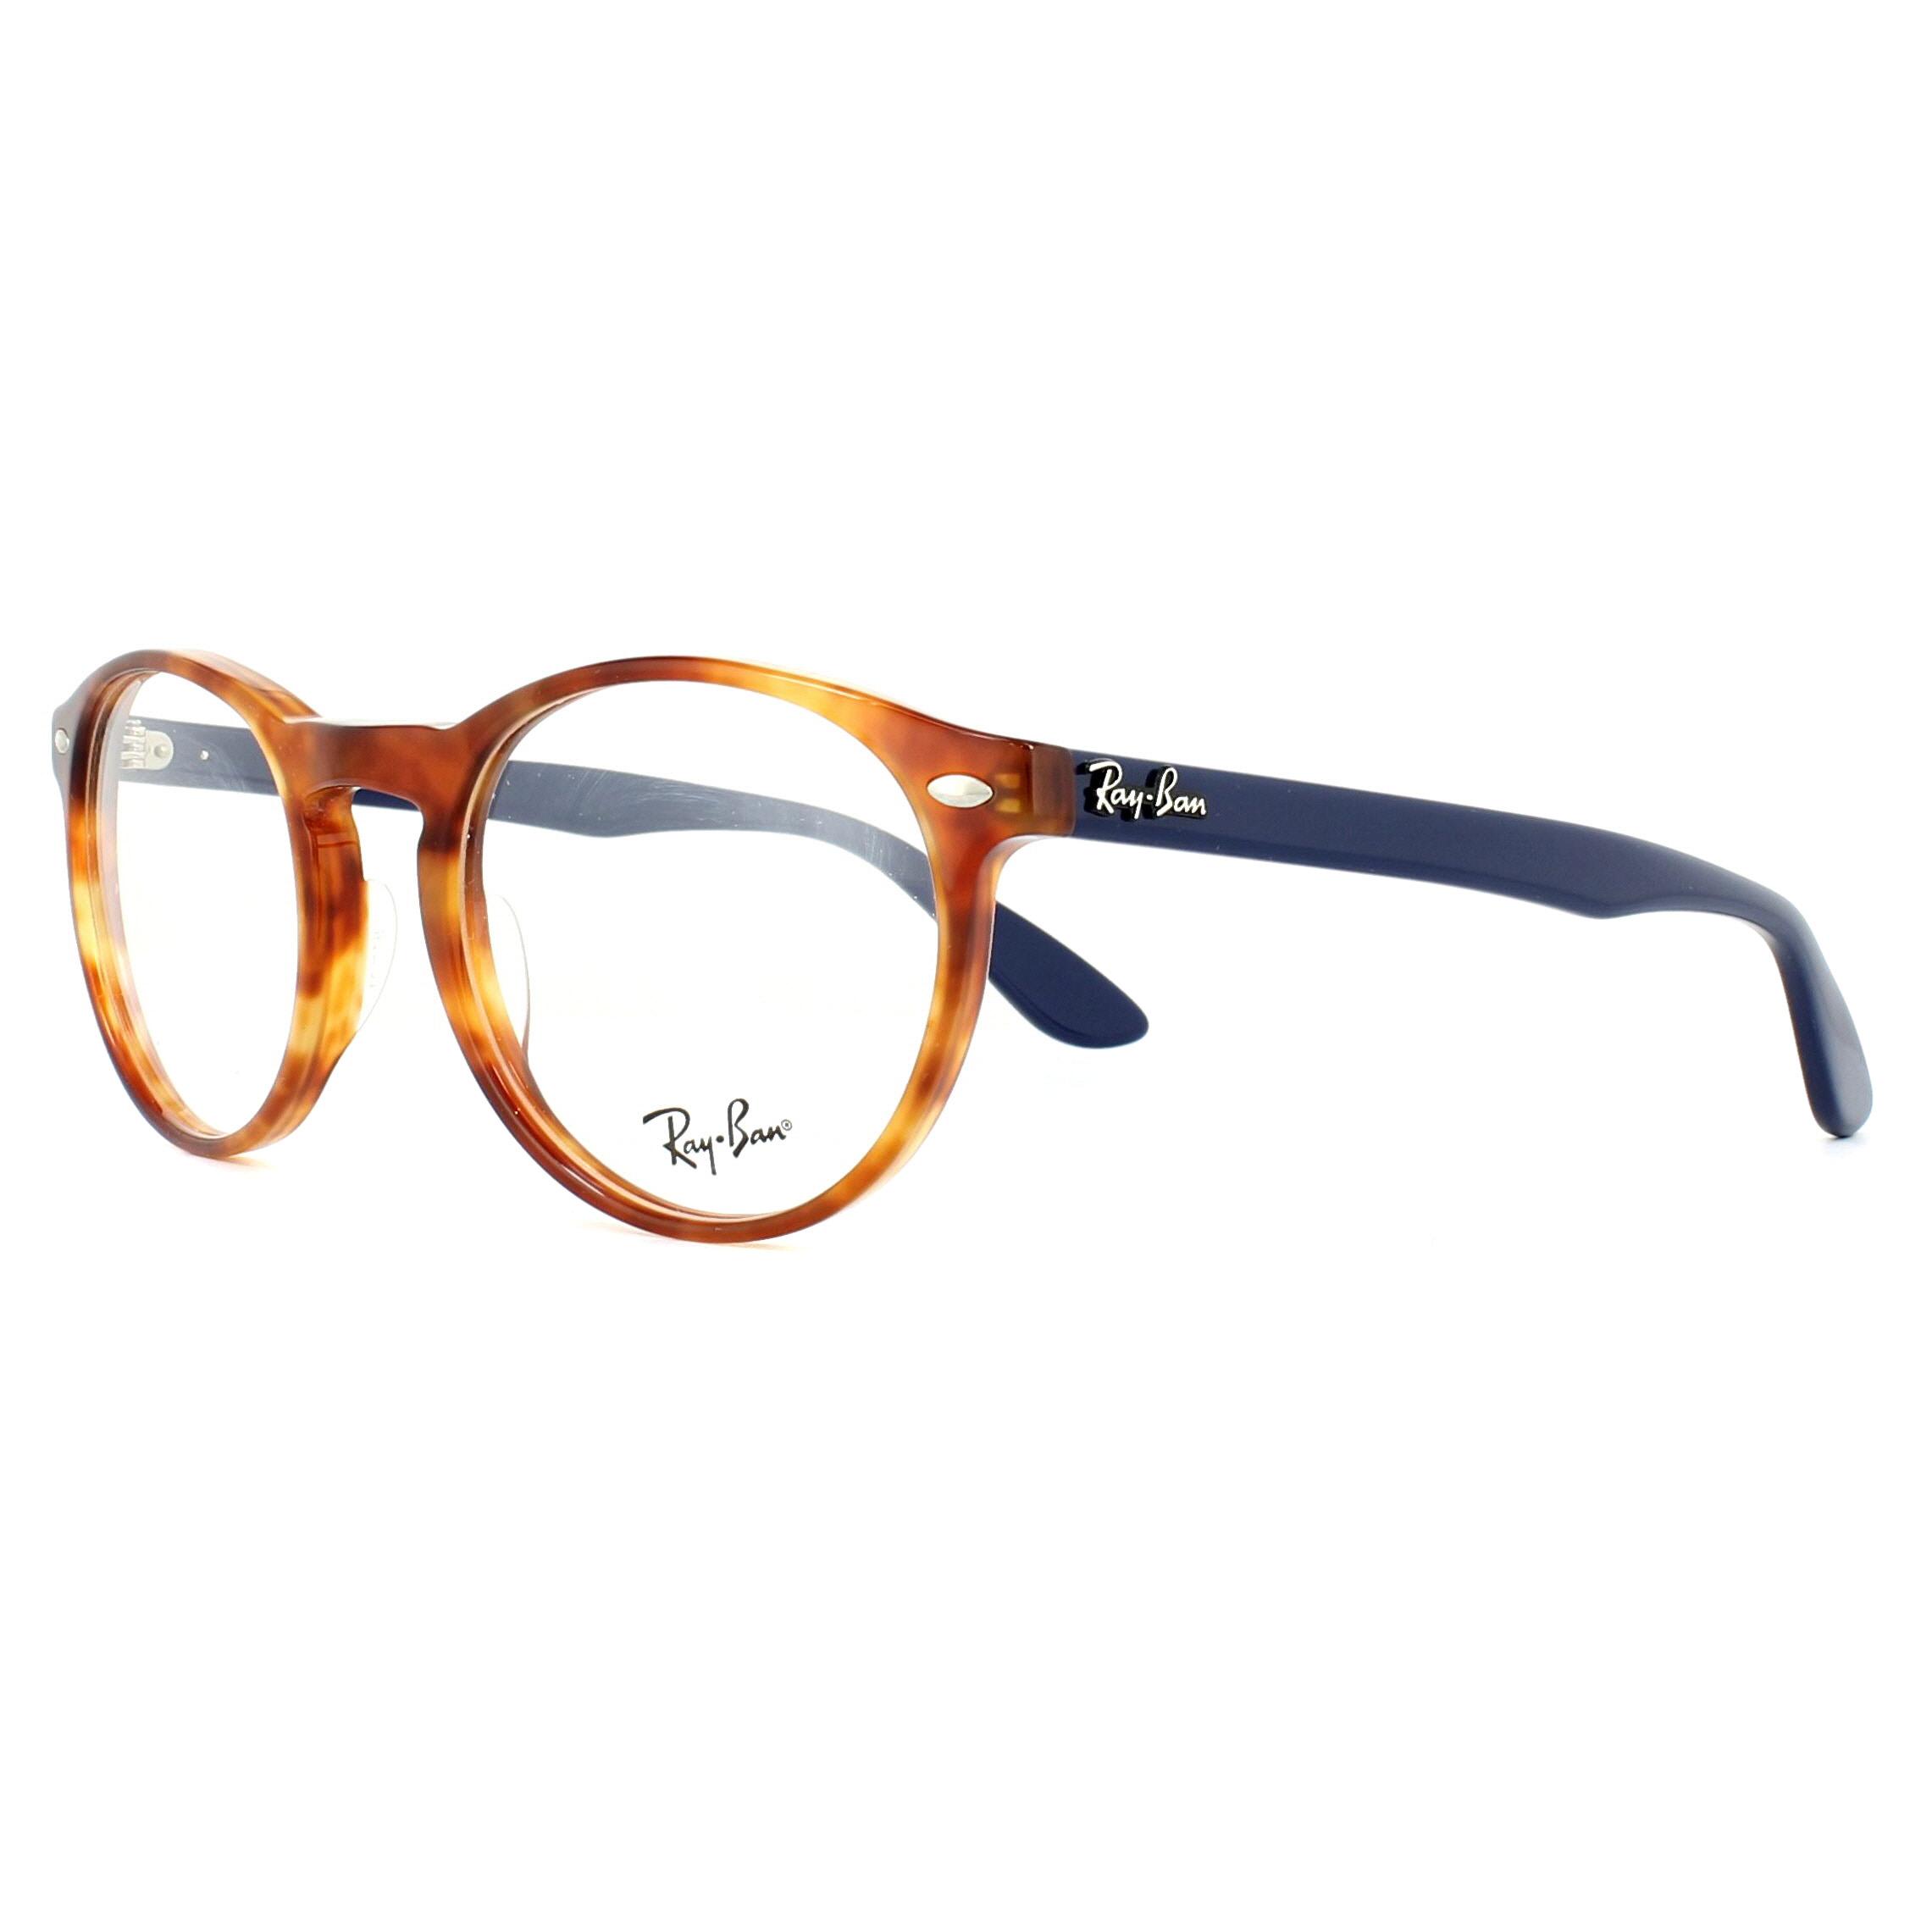 Ray-Ban Glasses Frames 5283 5609 Yellow Tortoise 51mm Mens Womens ...